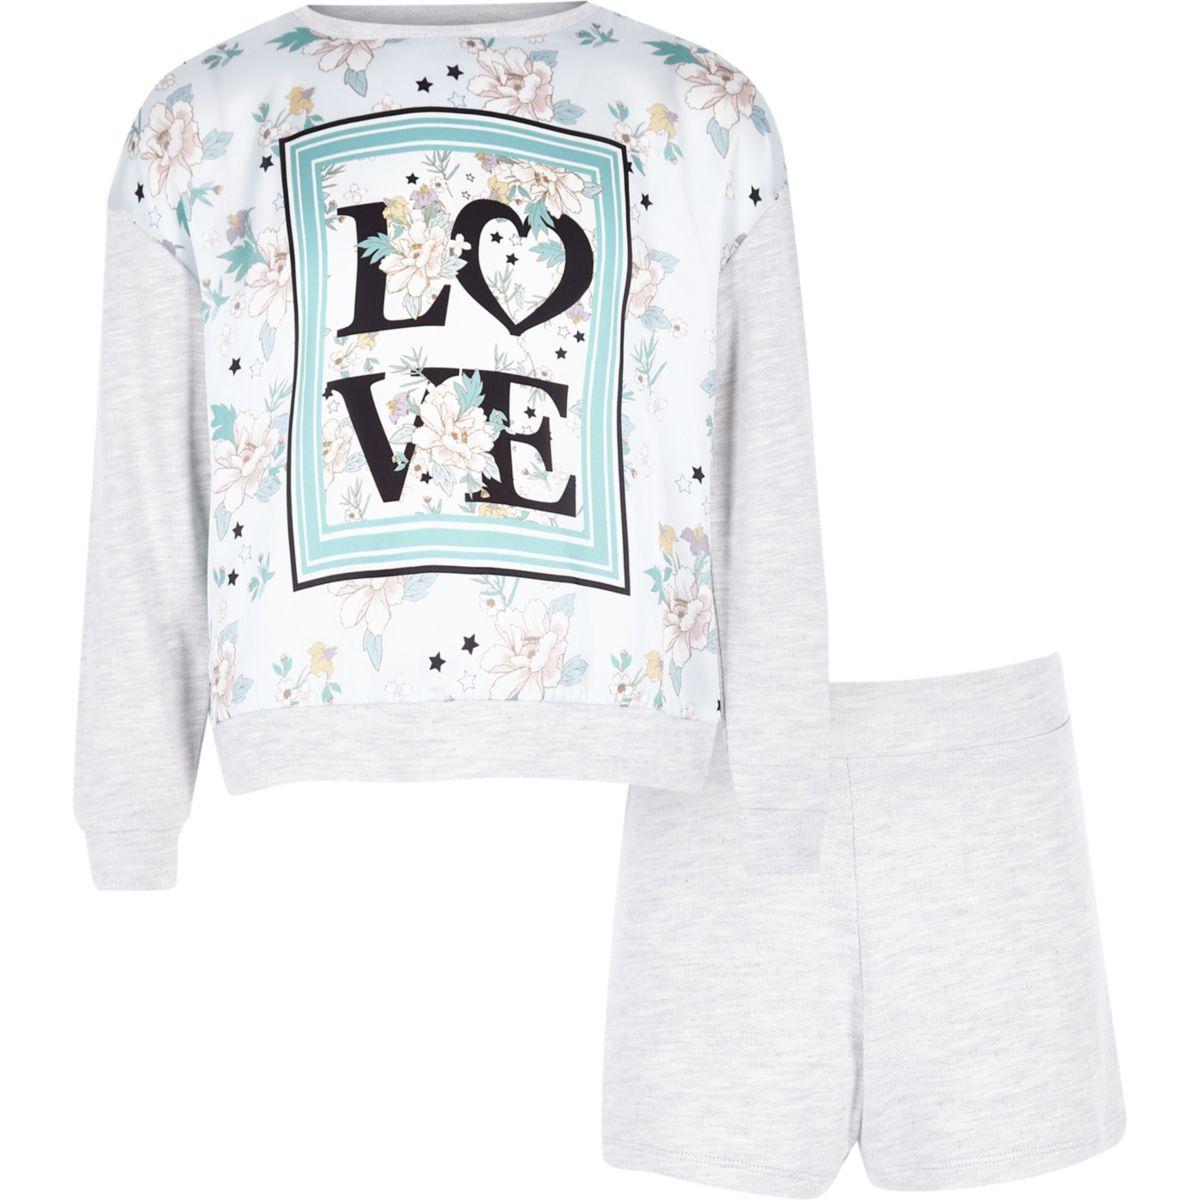 Pyjama à imprimé «love» gris pour fille